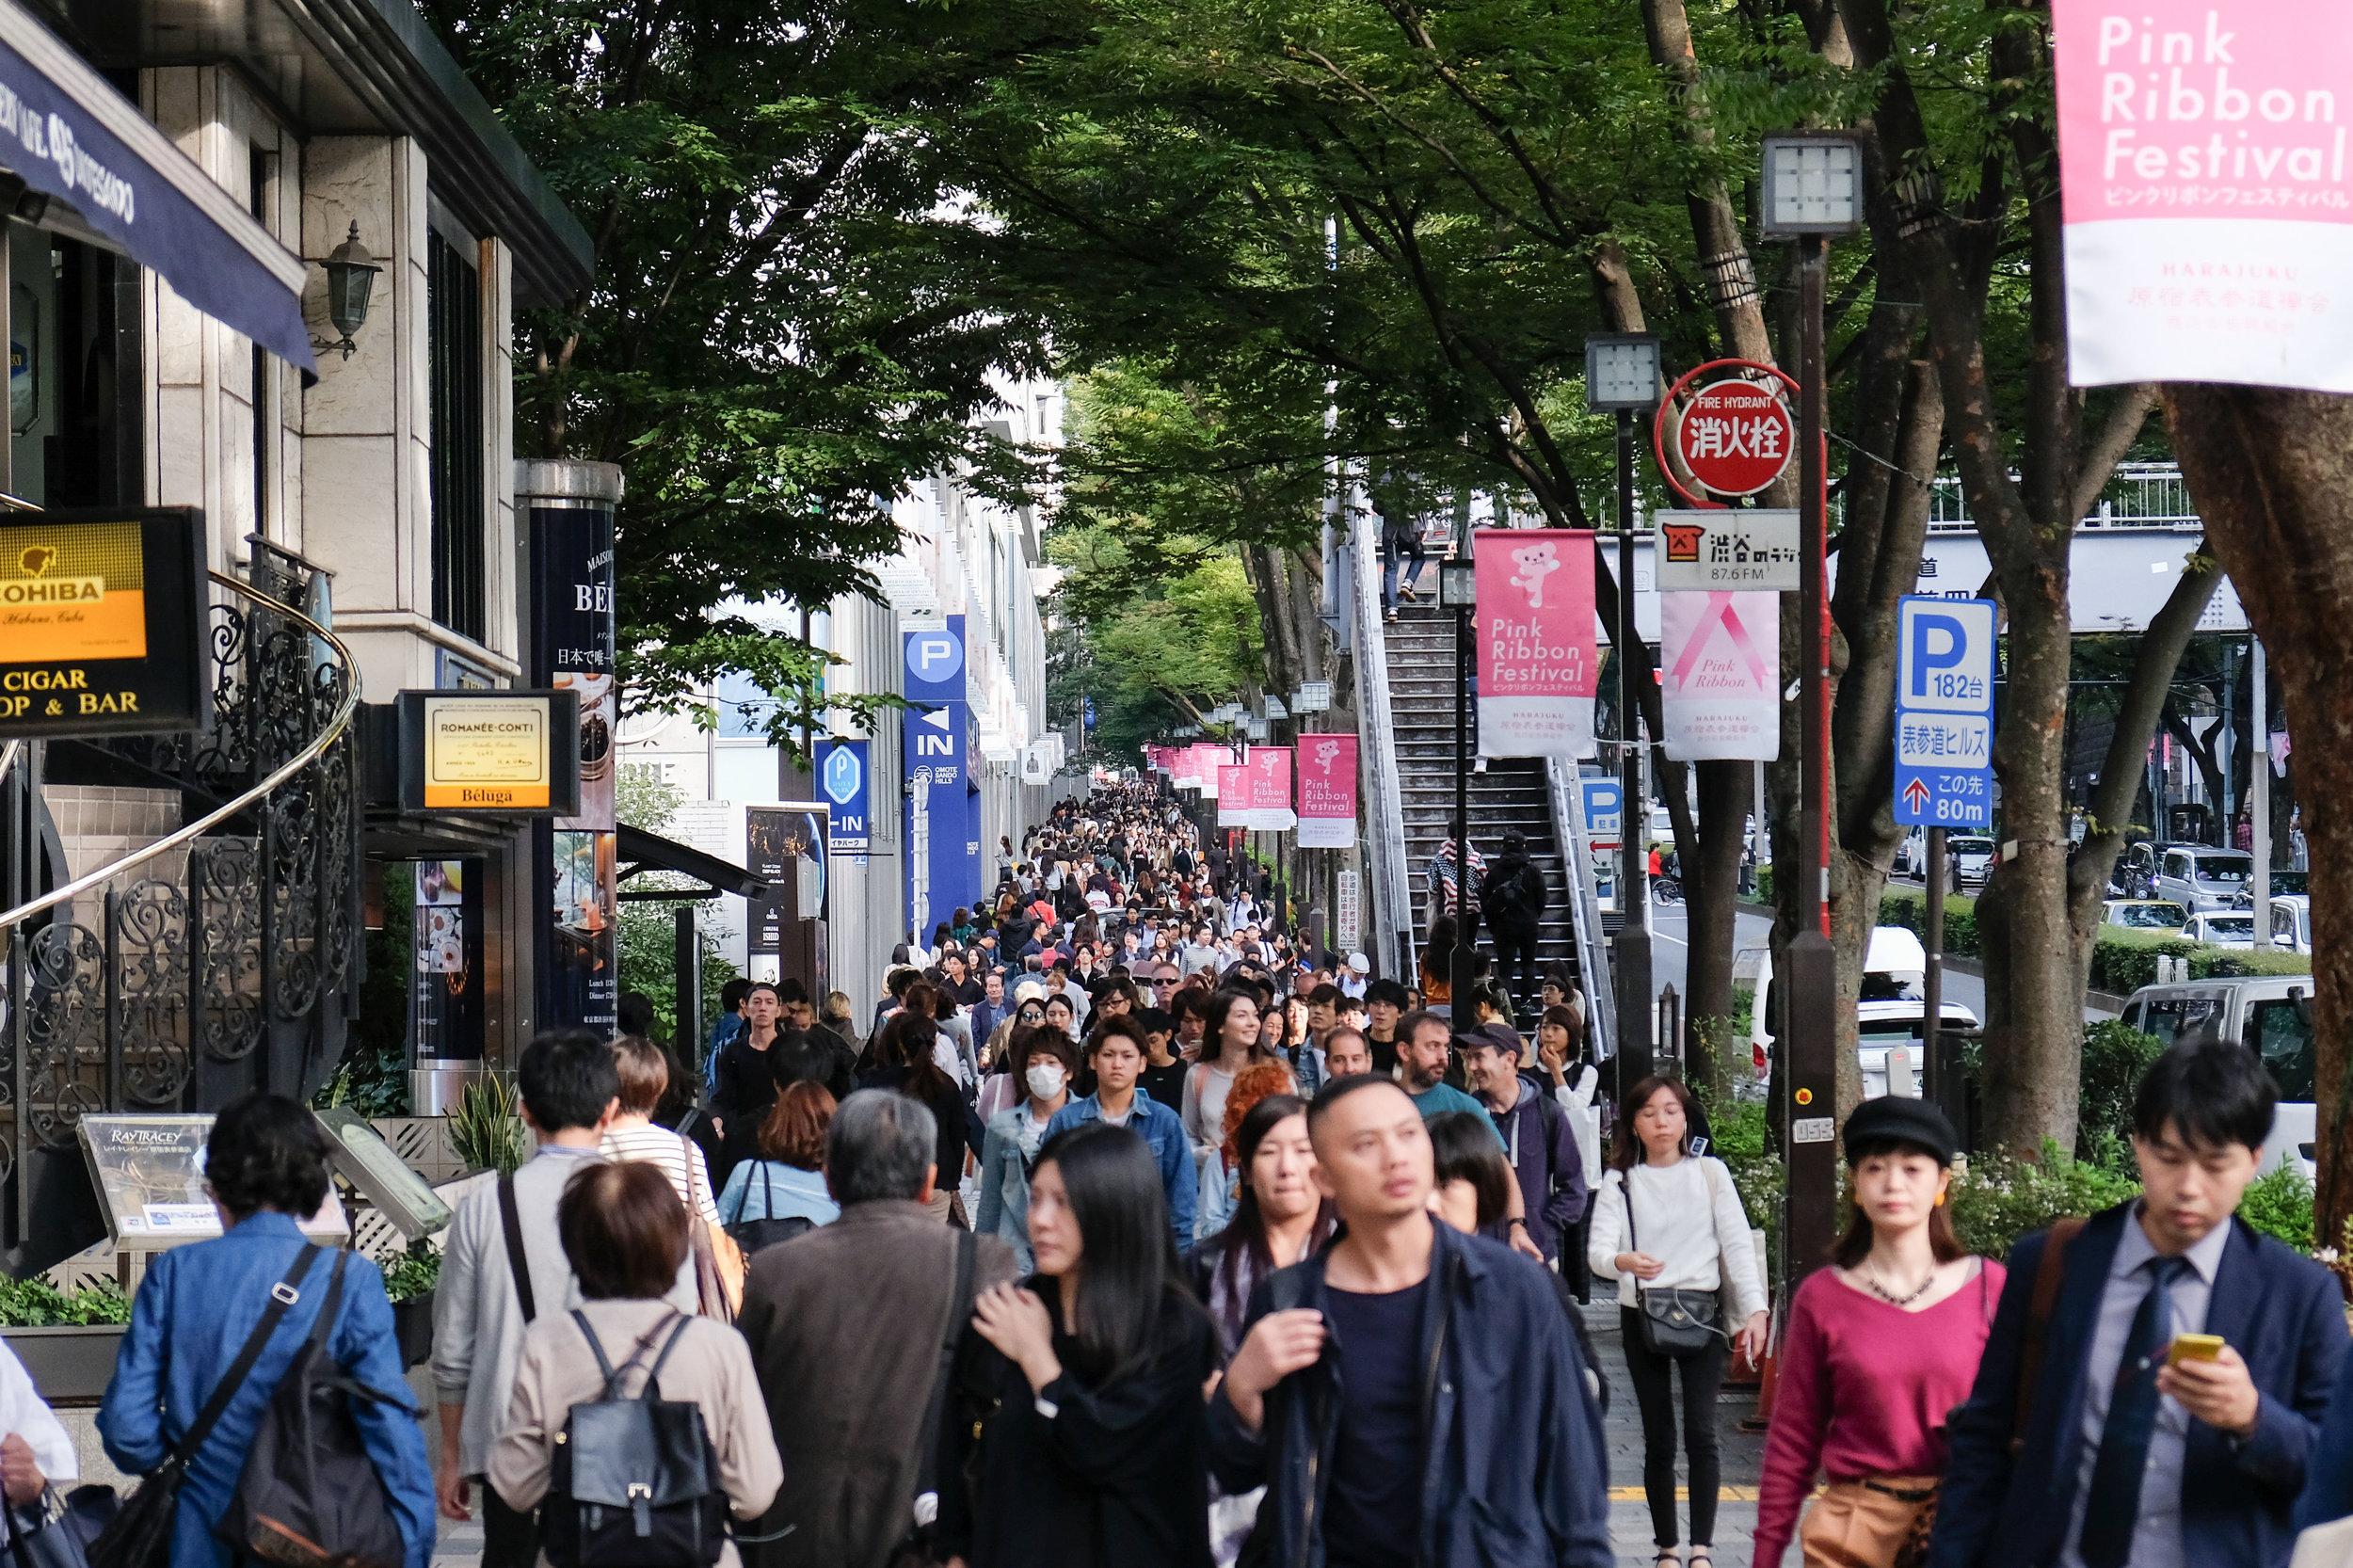 Tokyo Neighborhood guide: Harajuku & omotesando - October 18th, 2017